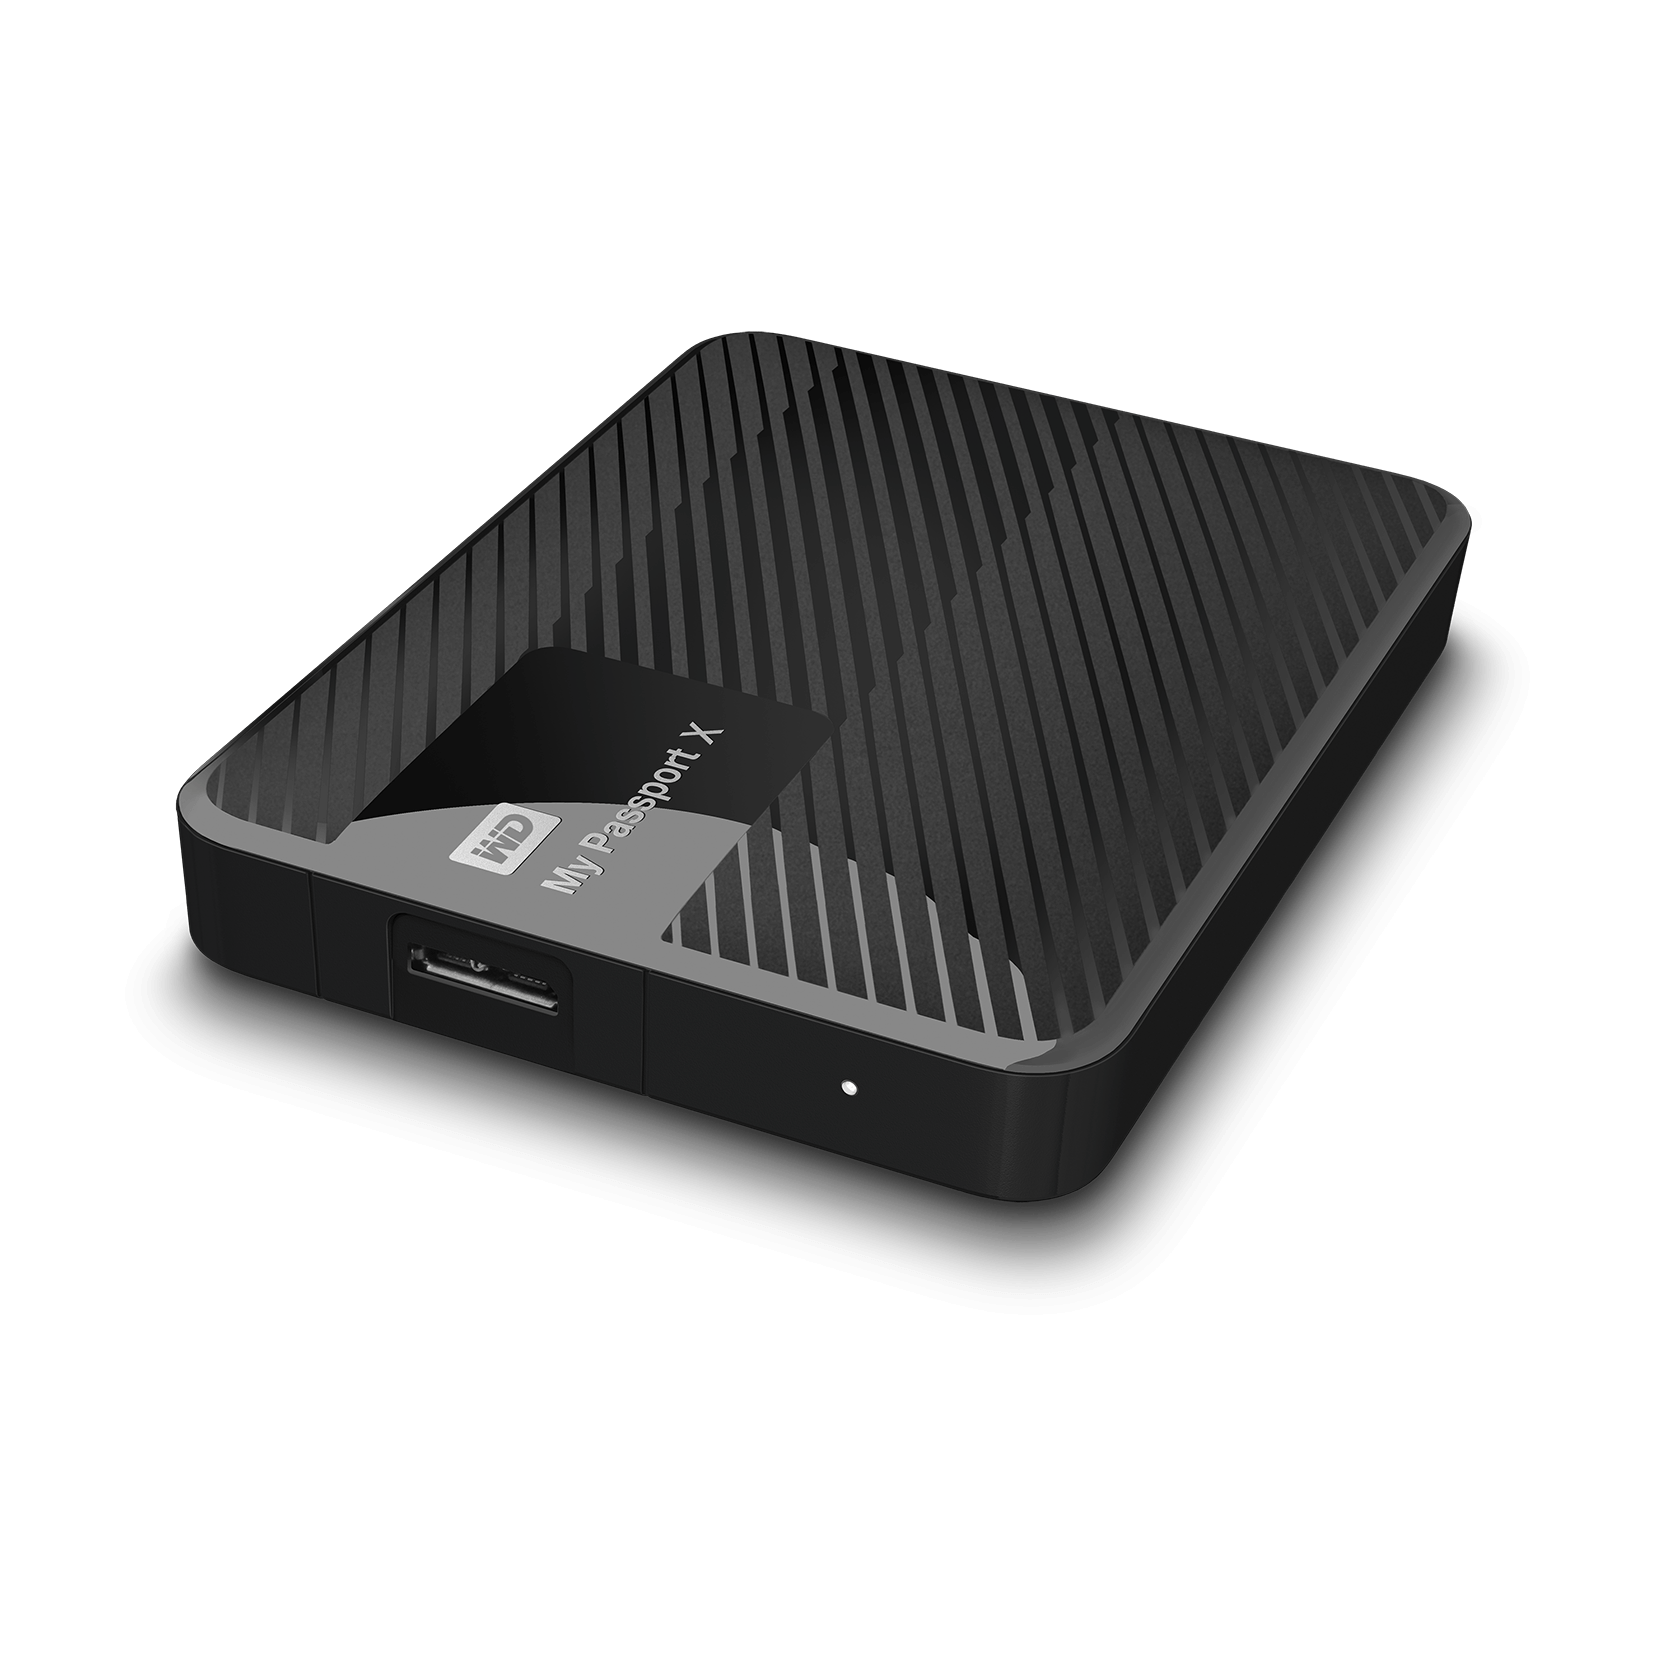 Black Xbox One// PC Gaming WD My Passport X 2TB Portable External Hard Drive